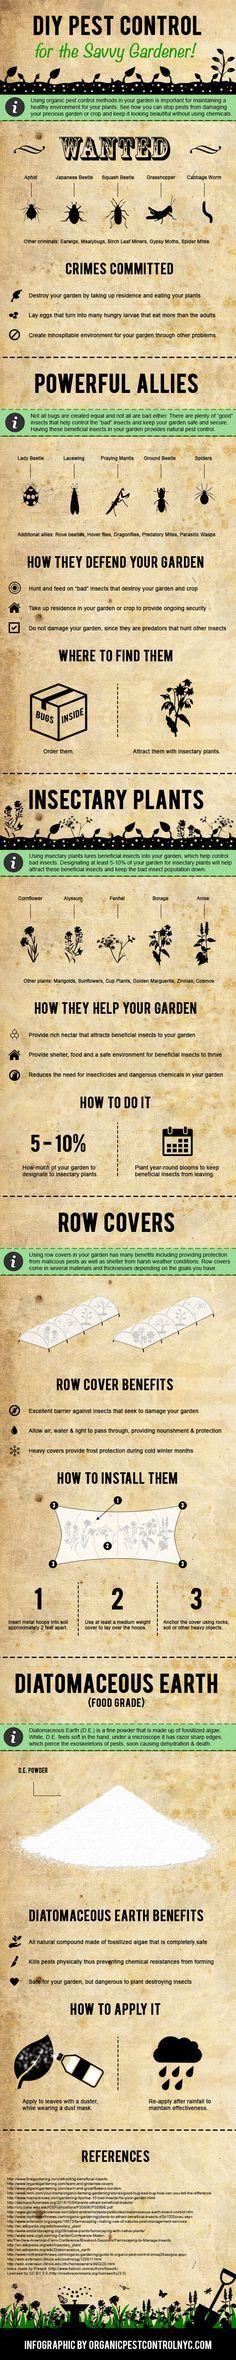 DIY Pest Control for the Savvy Gardener!